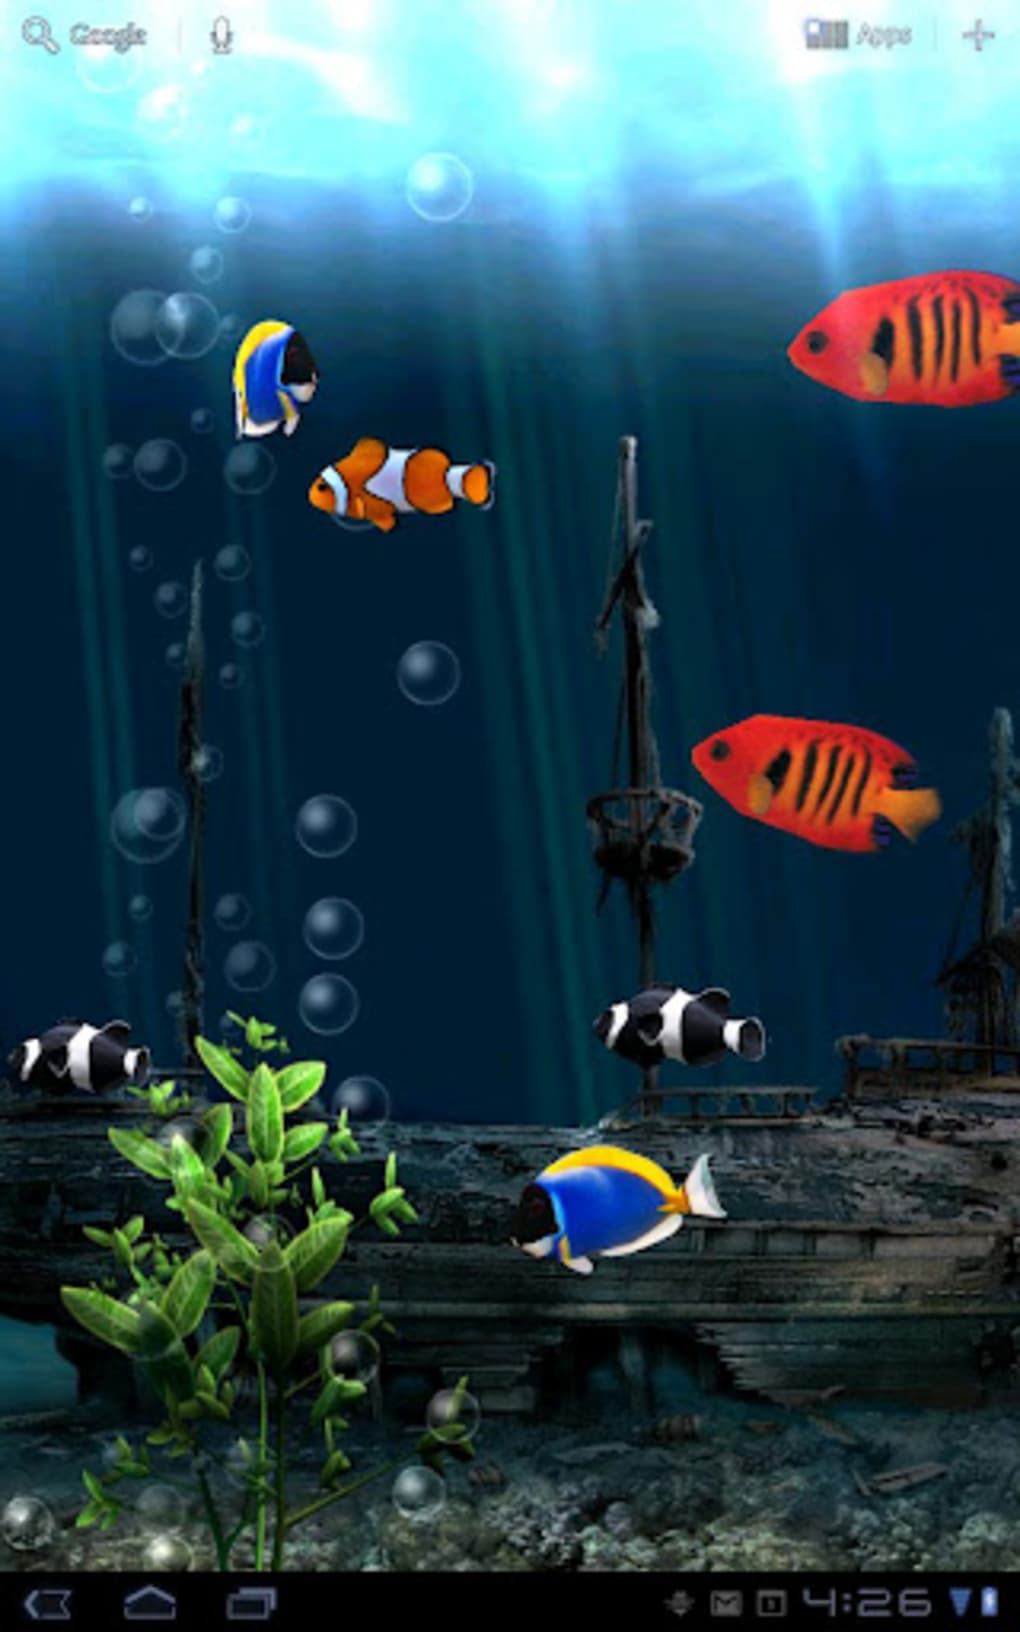 Aquarium Free Live Wallpaper For Android 無料 ダウンロード